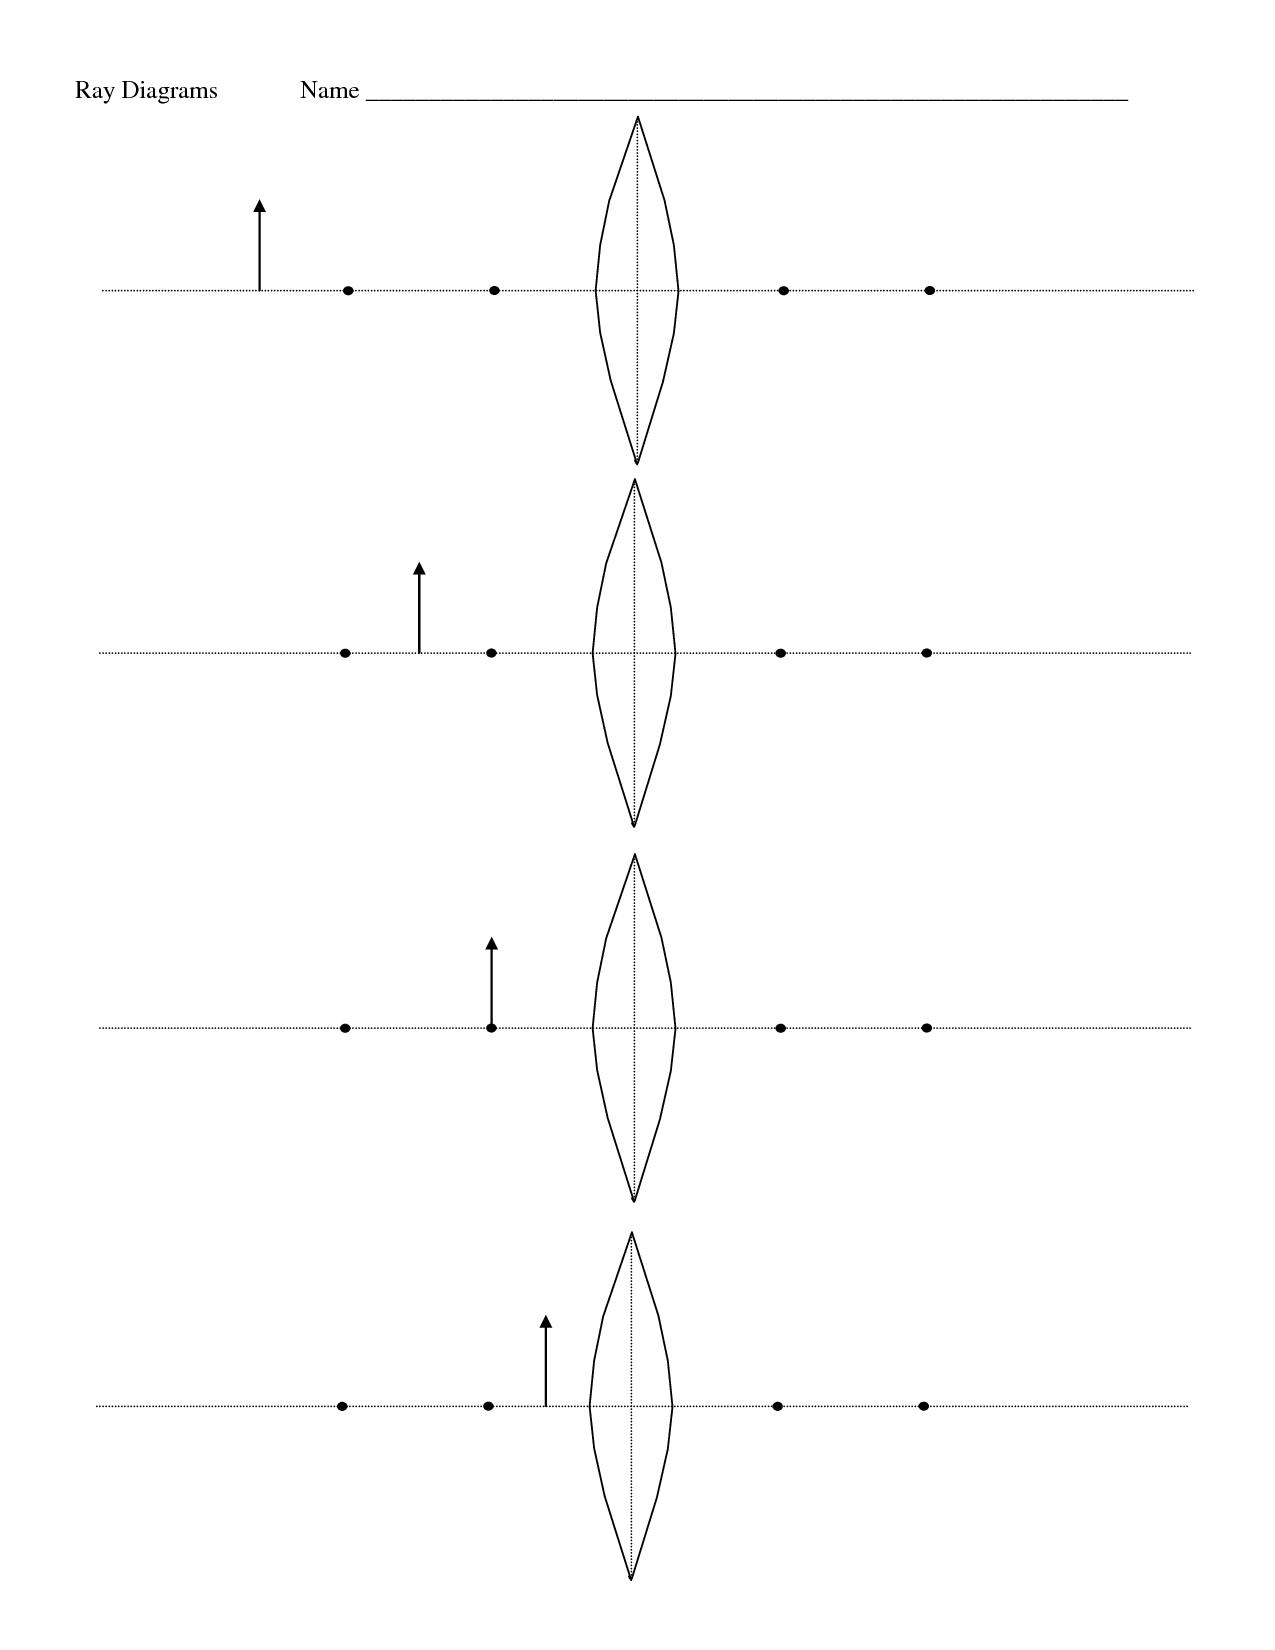 light ray diagram worksheets 24 volt trolling motor wiring 10 best images of convex lenses practice worksheet key